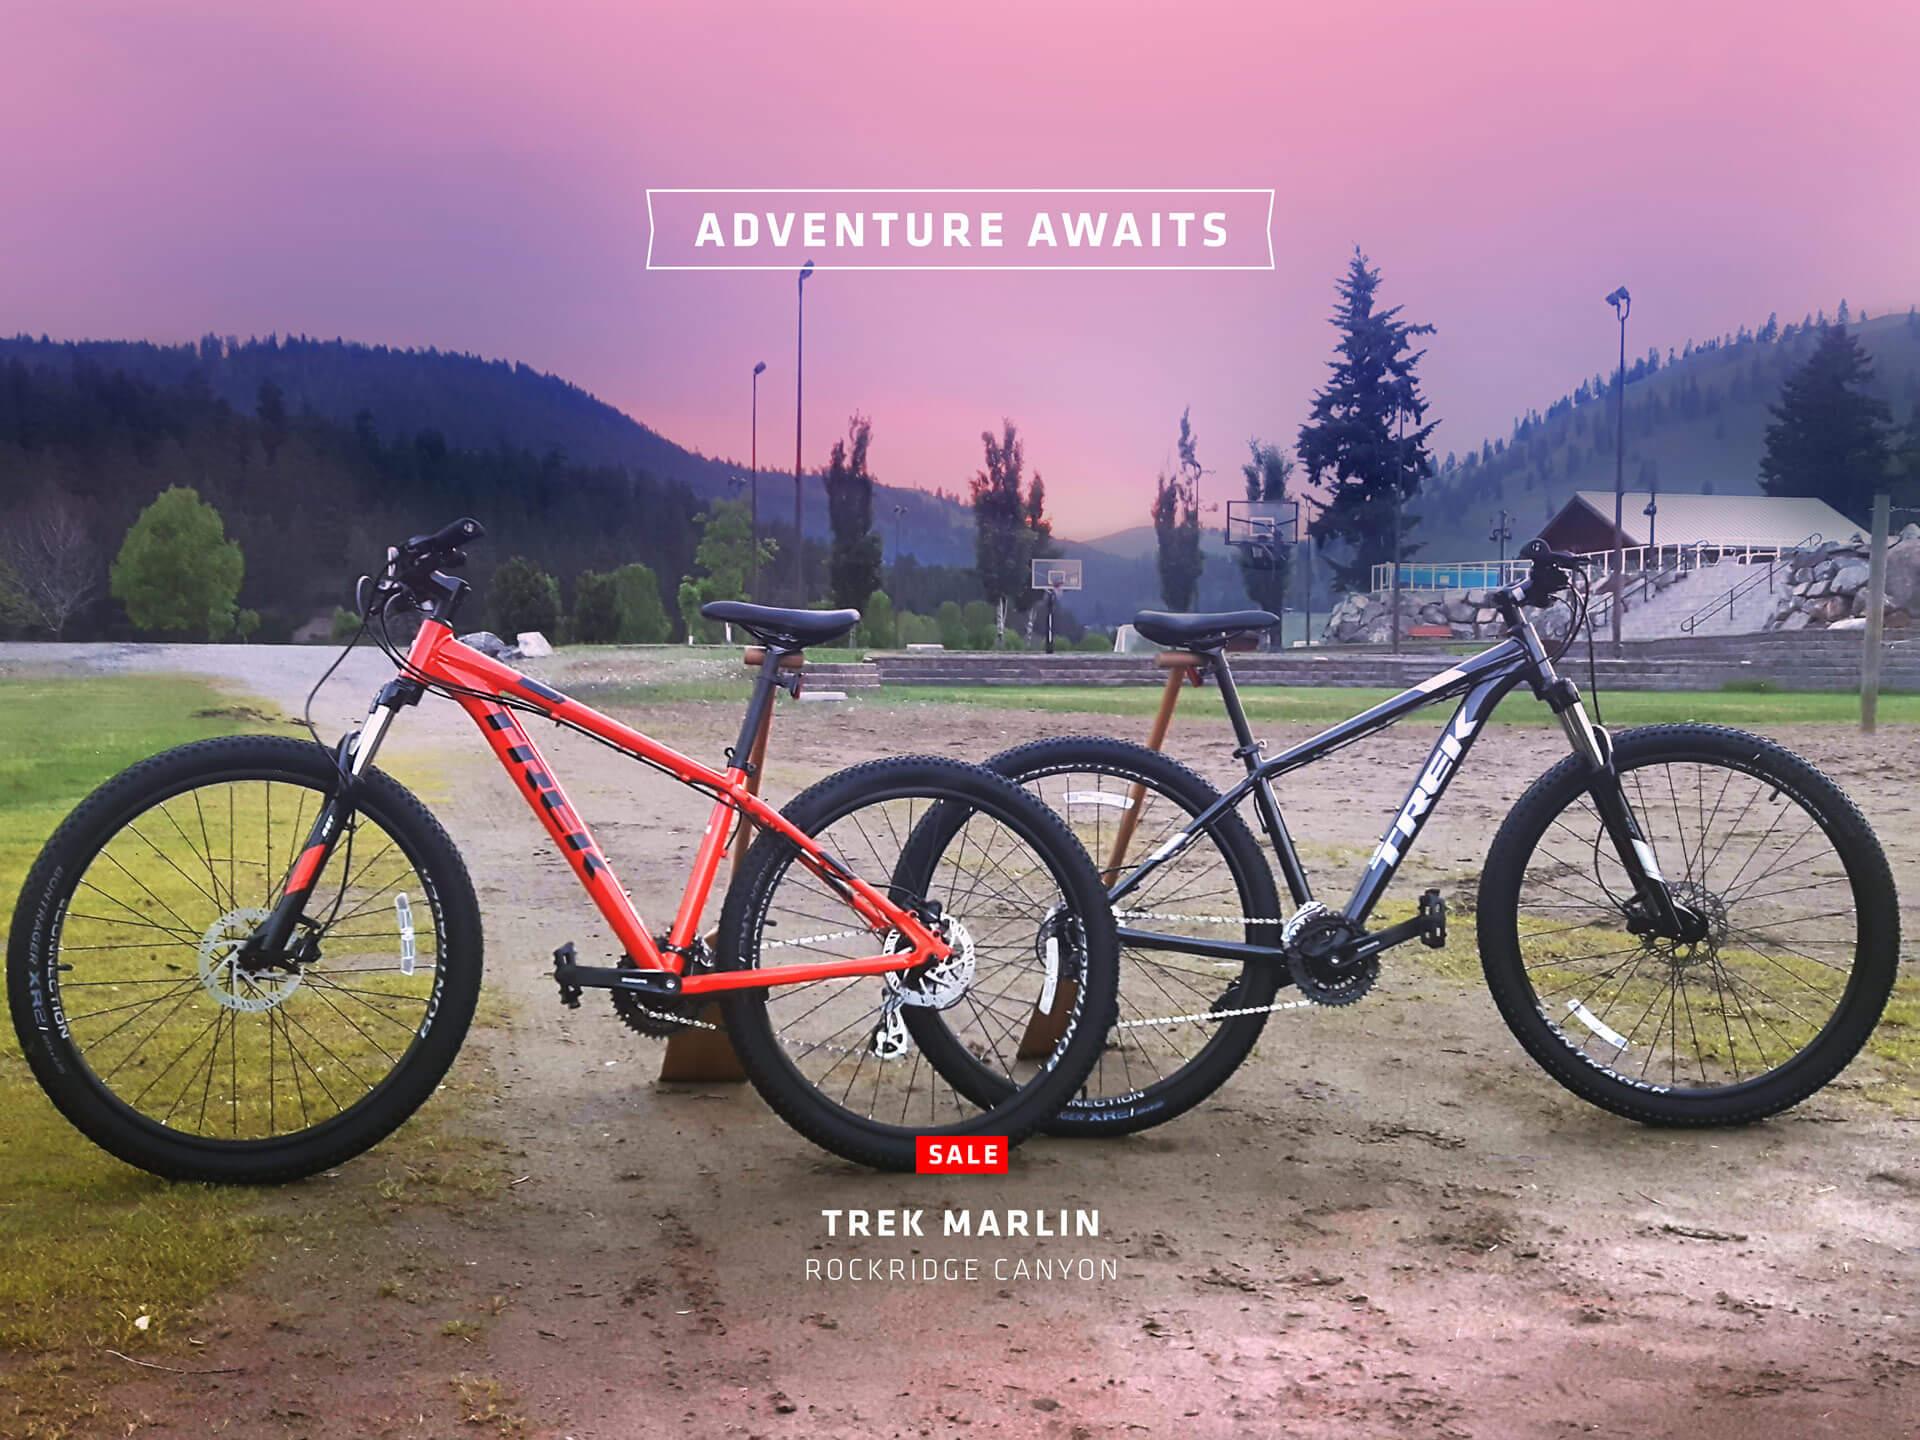 Mountain Bikes at RockRidge Canyon Retreat Centre